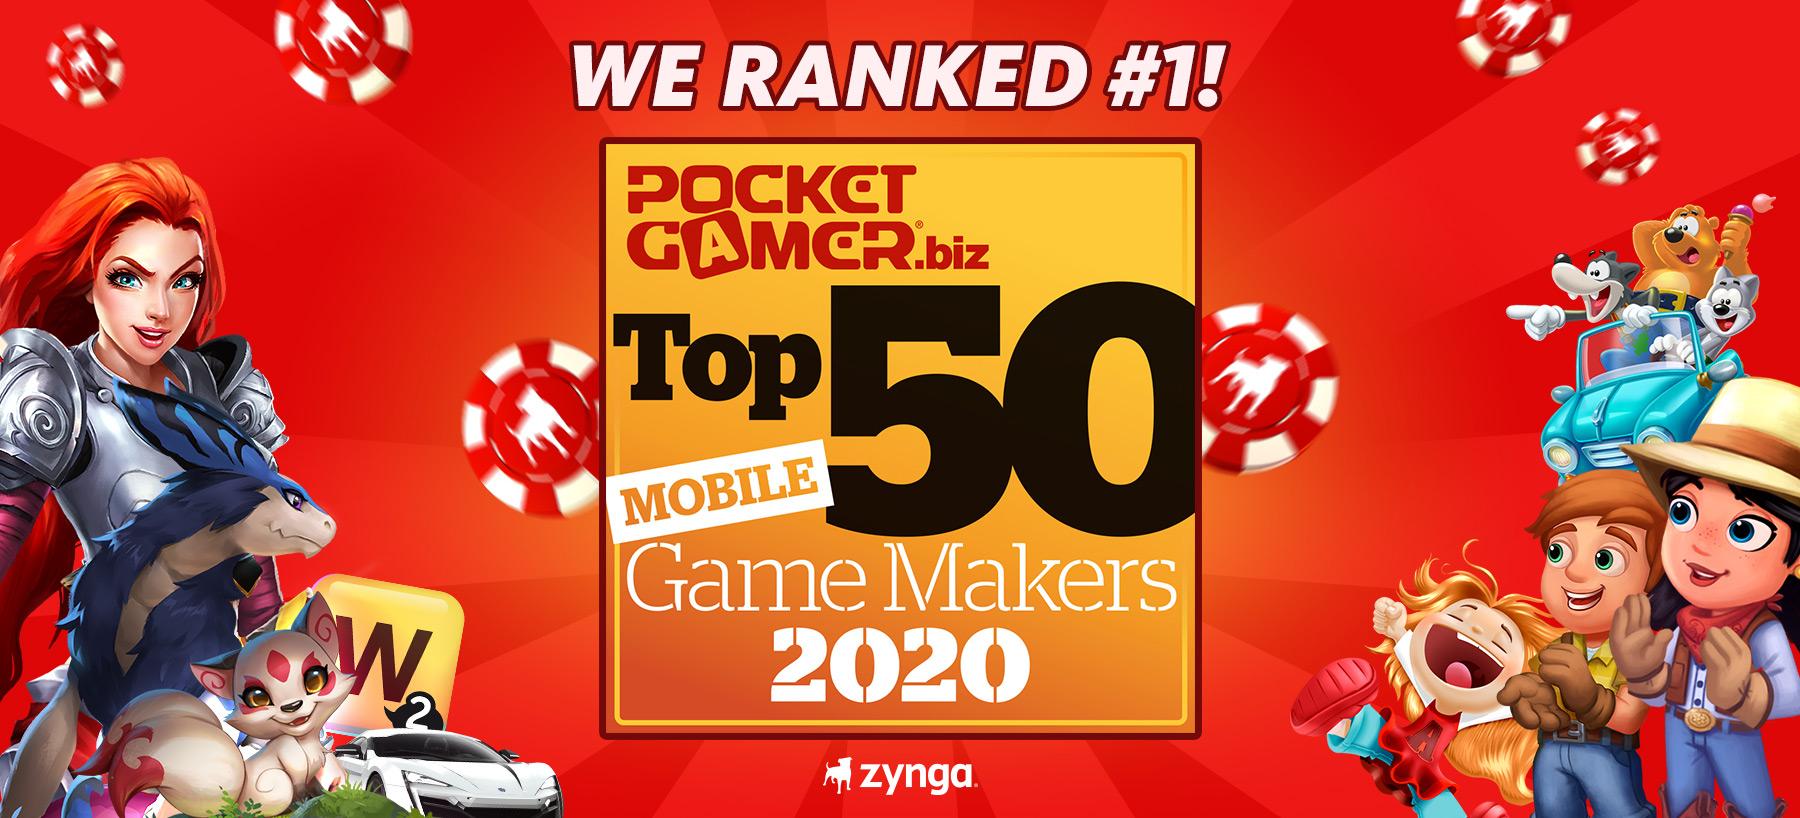 Zynga Banner Image